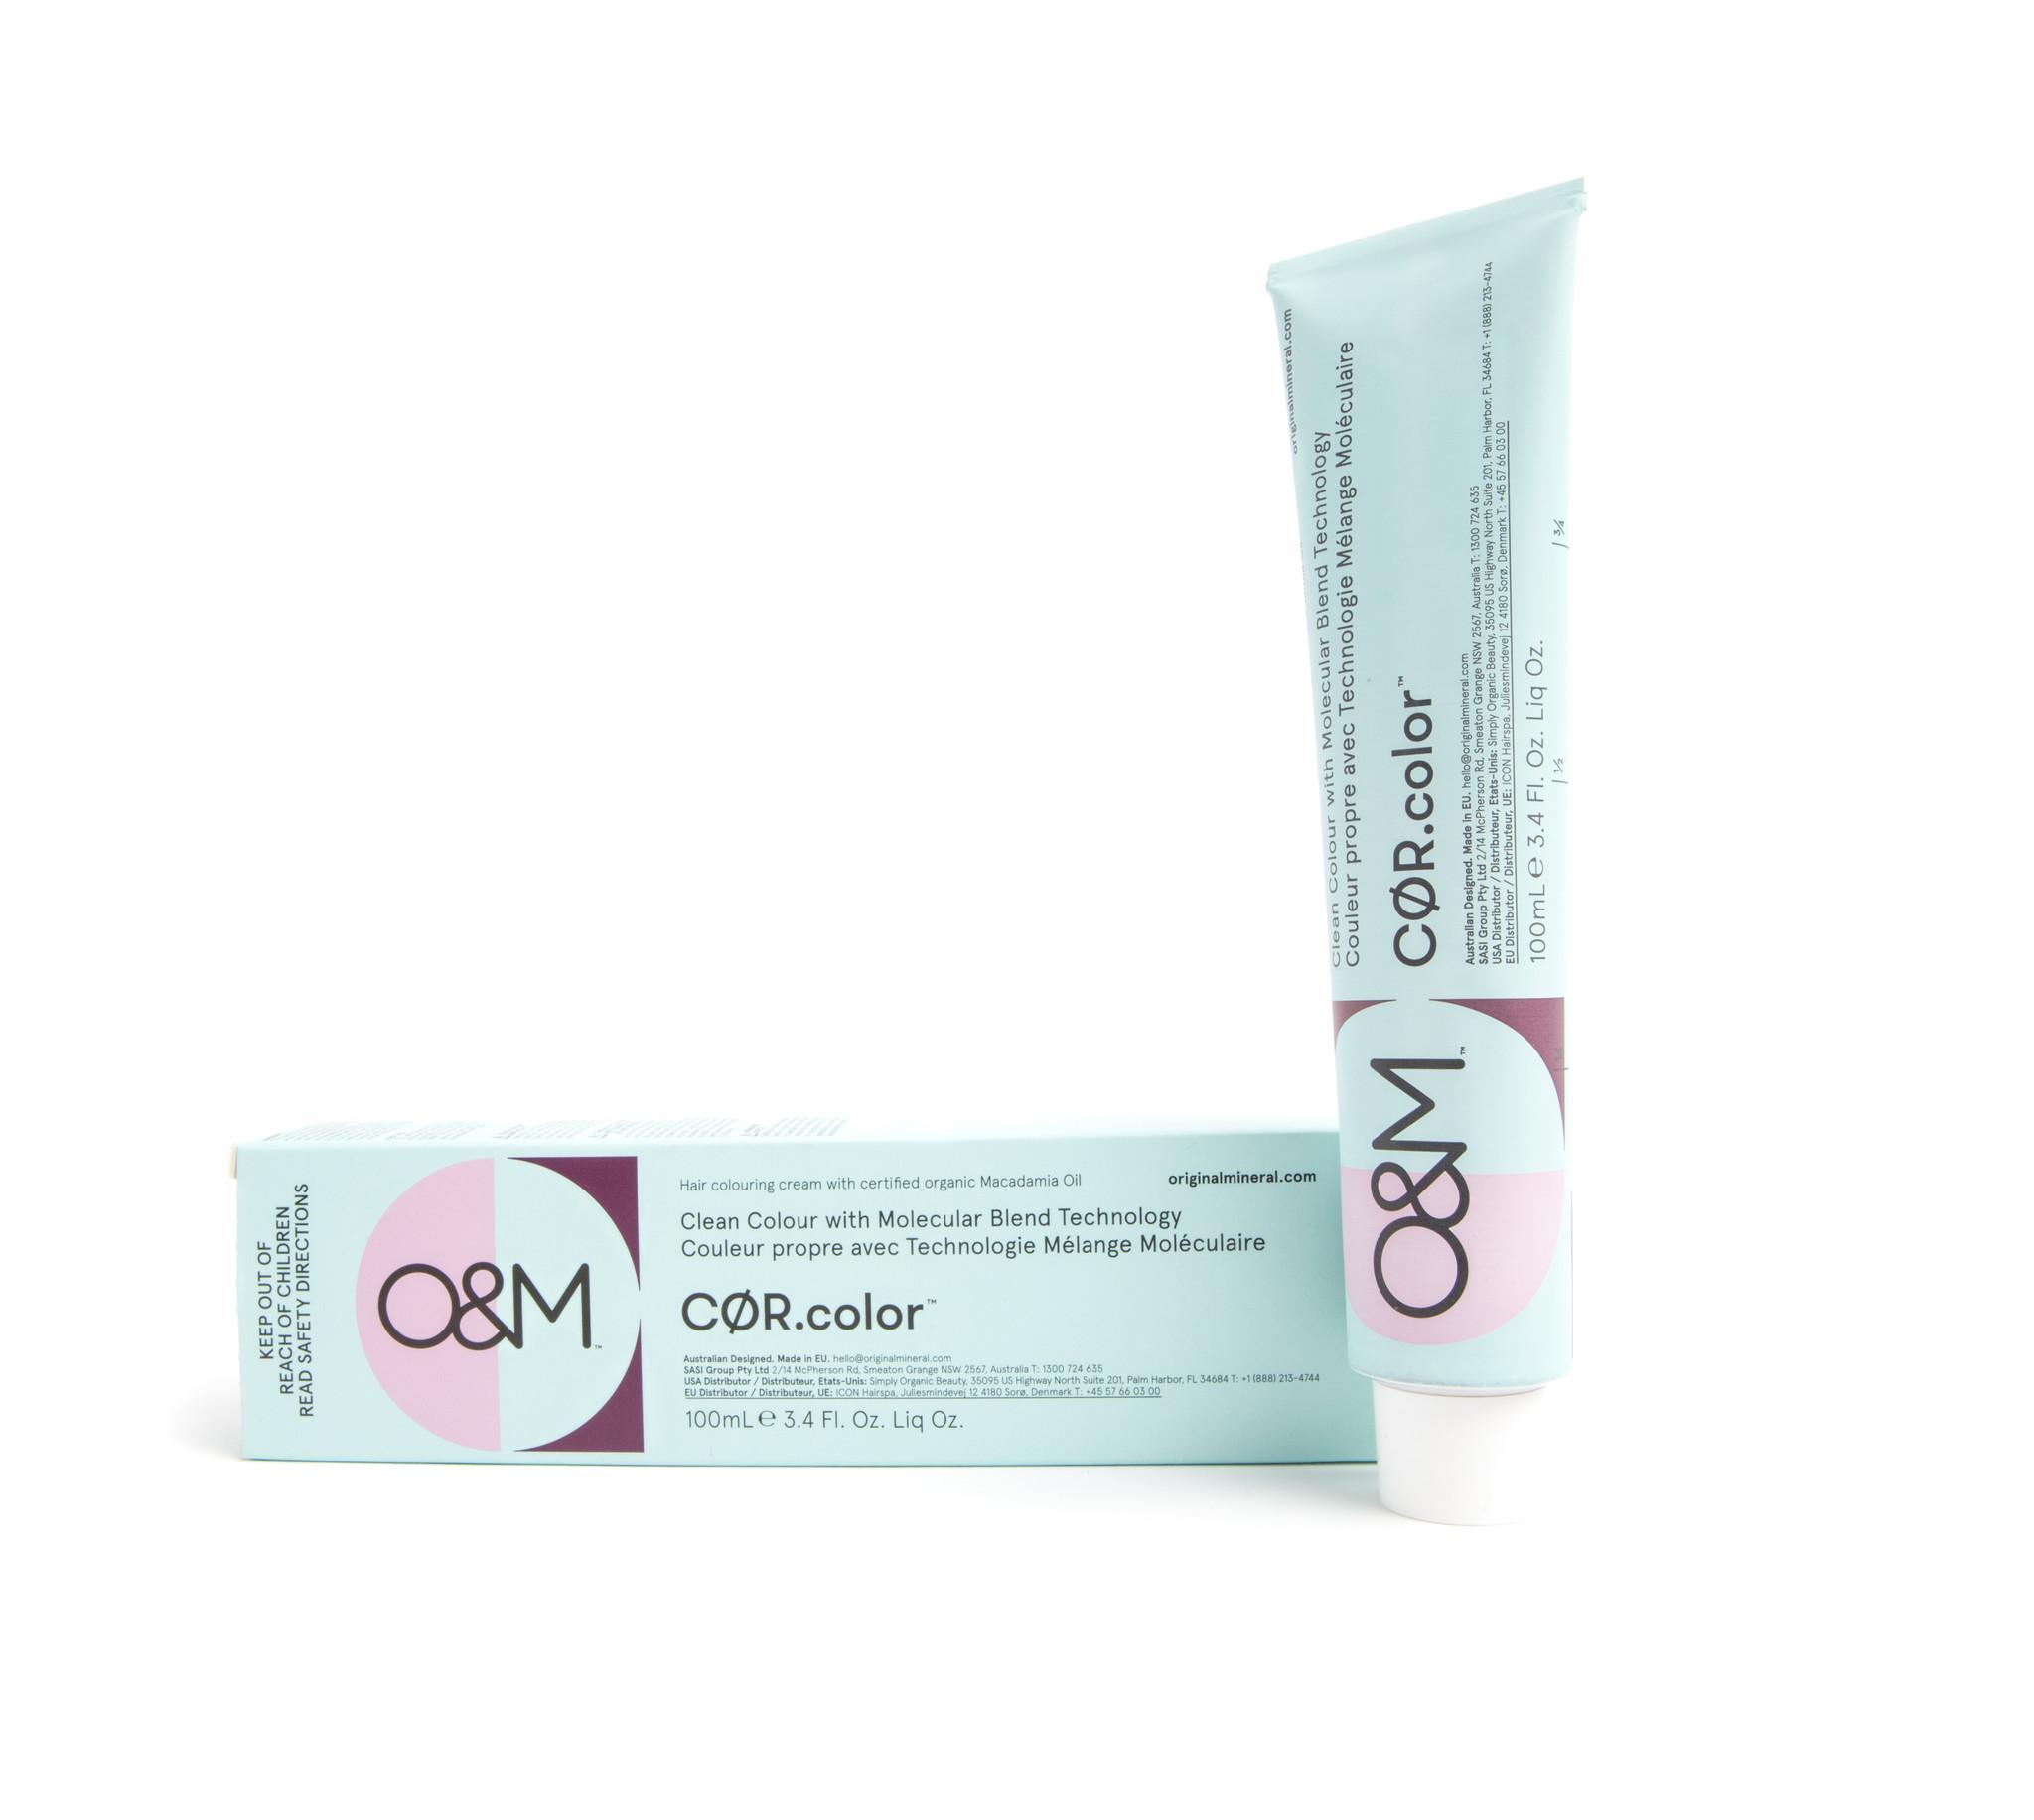 O&M - Original Mineral O&M CØR.color Apricot Pastel 100g